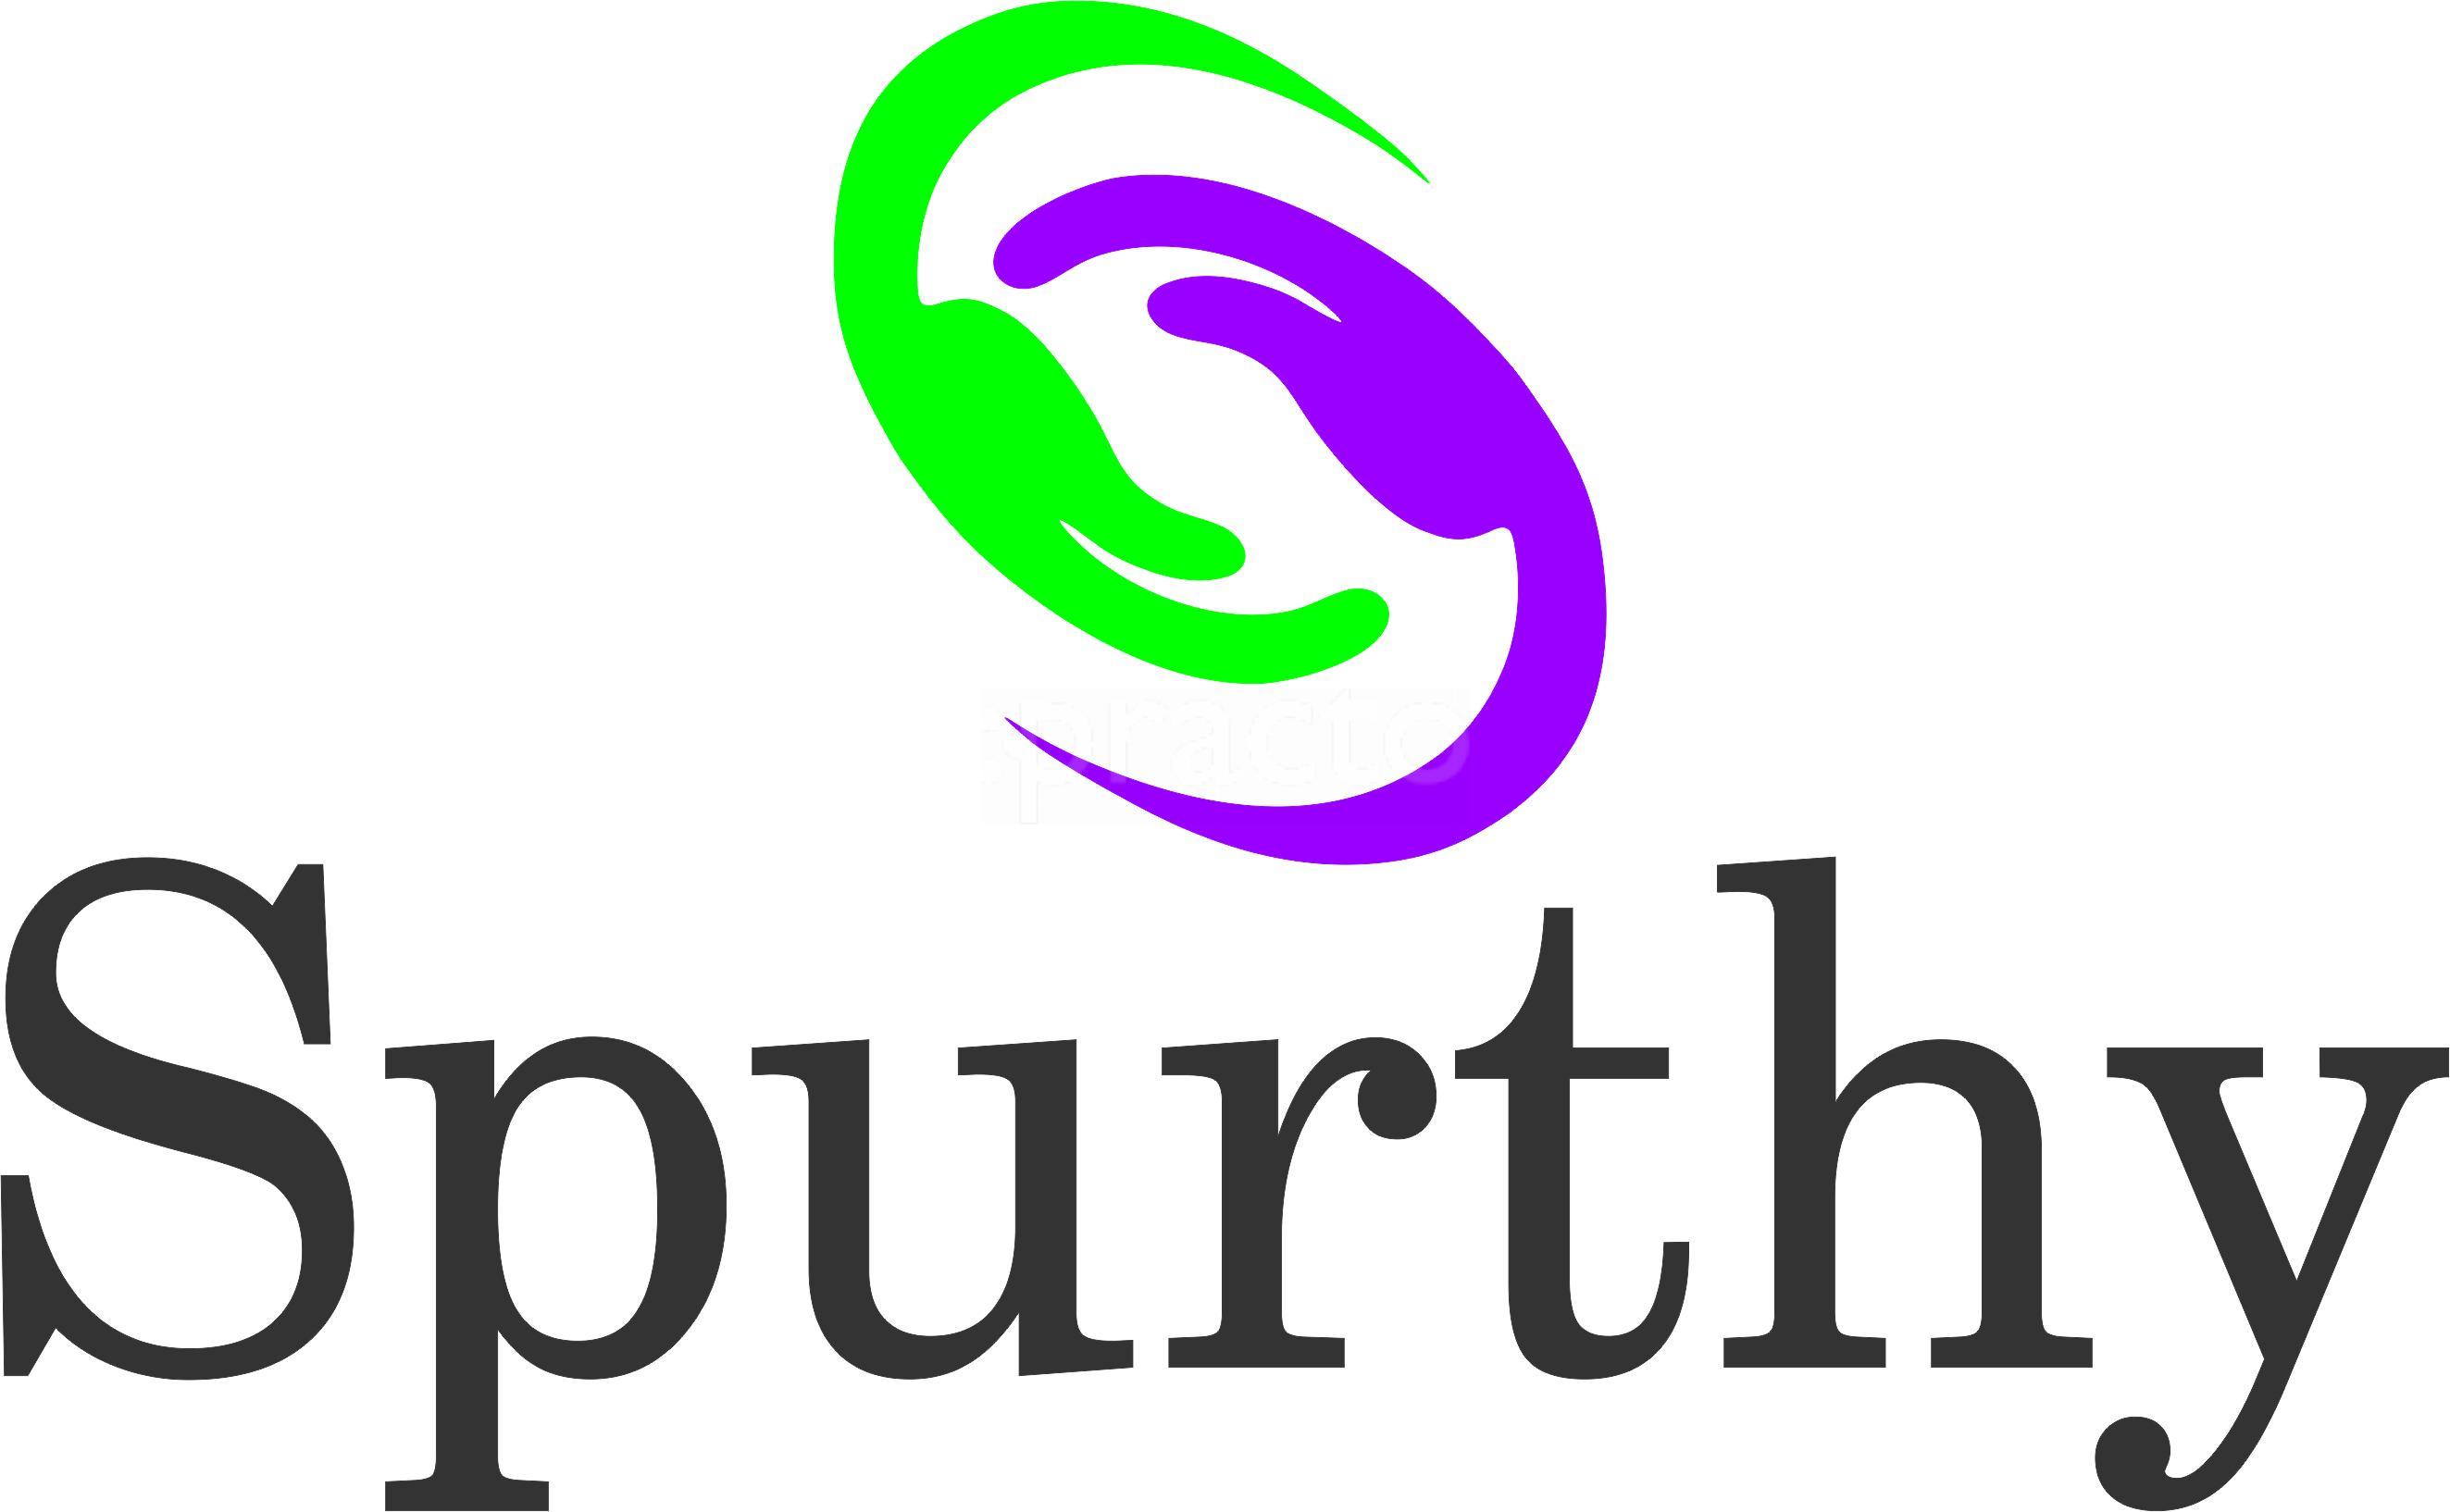 Spurthy Hospital